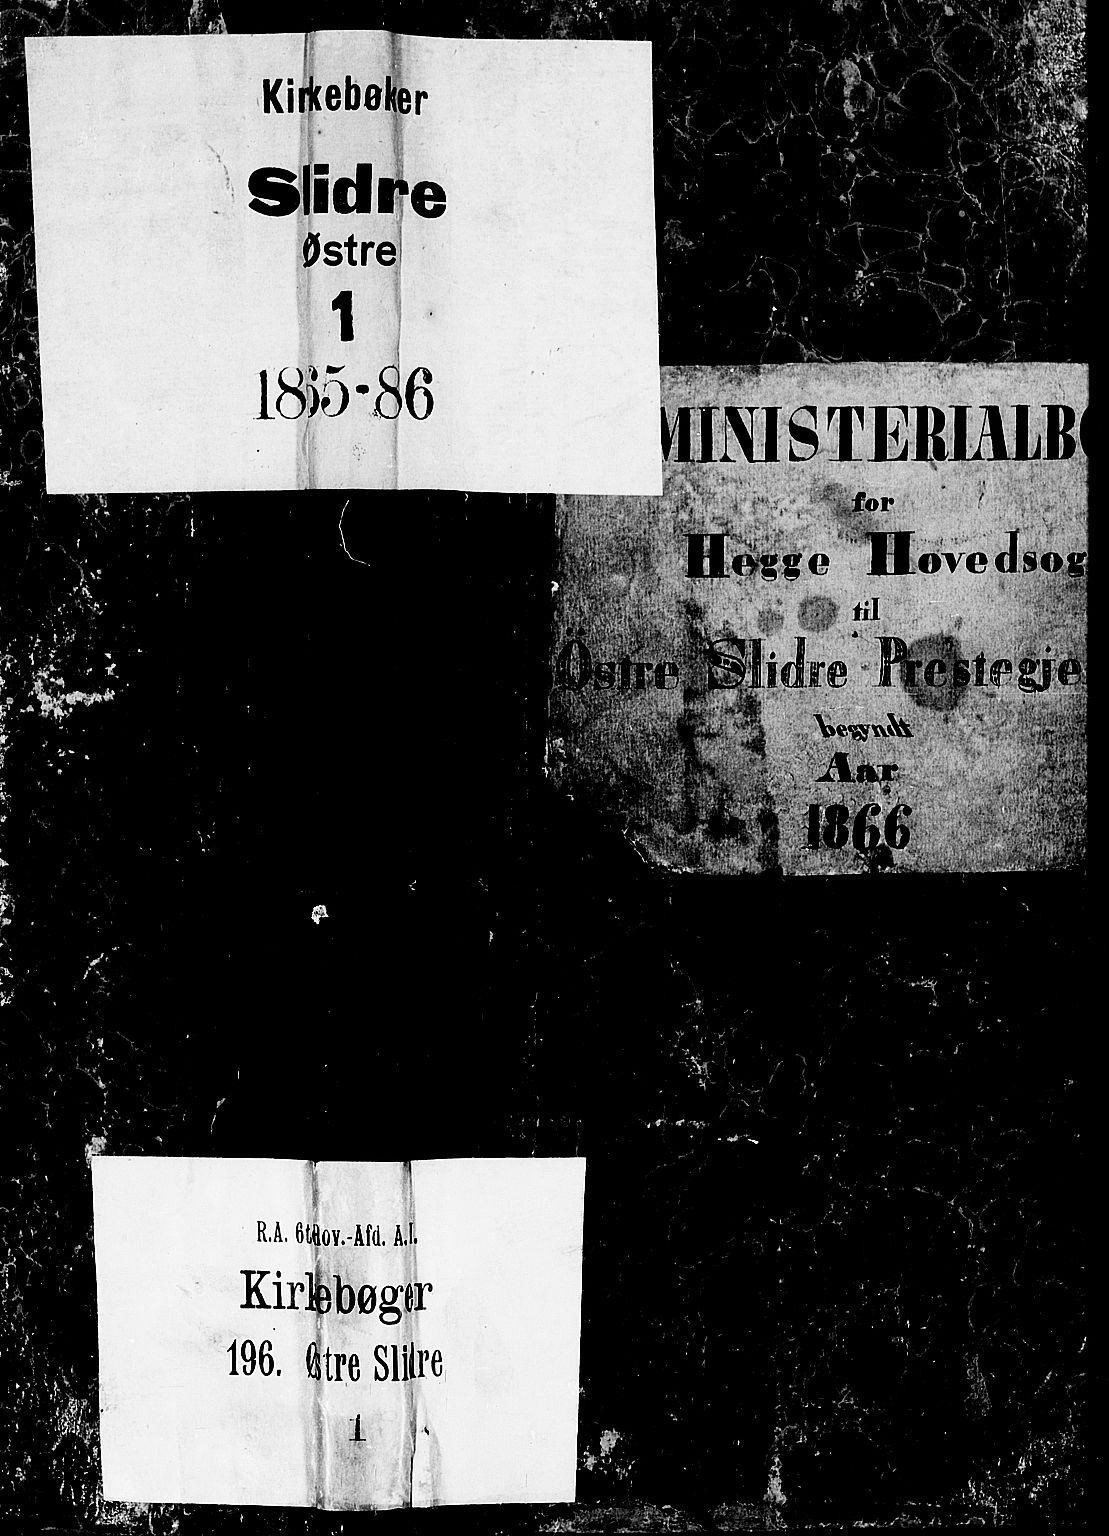 SAH, Øystre Slidre prestekontor, Klokkerbok nr. 1, 1866-1886